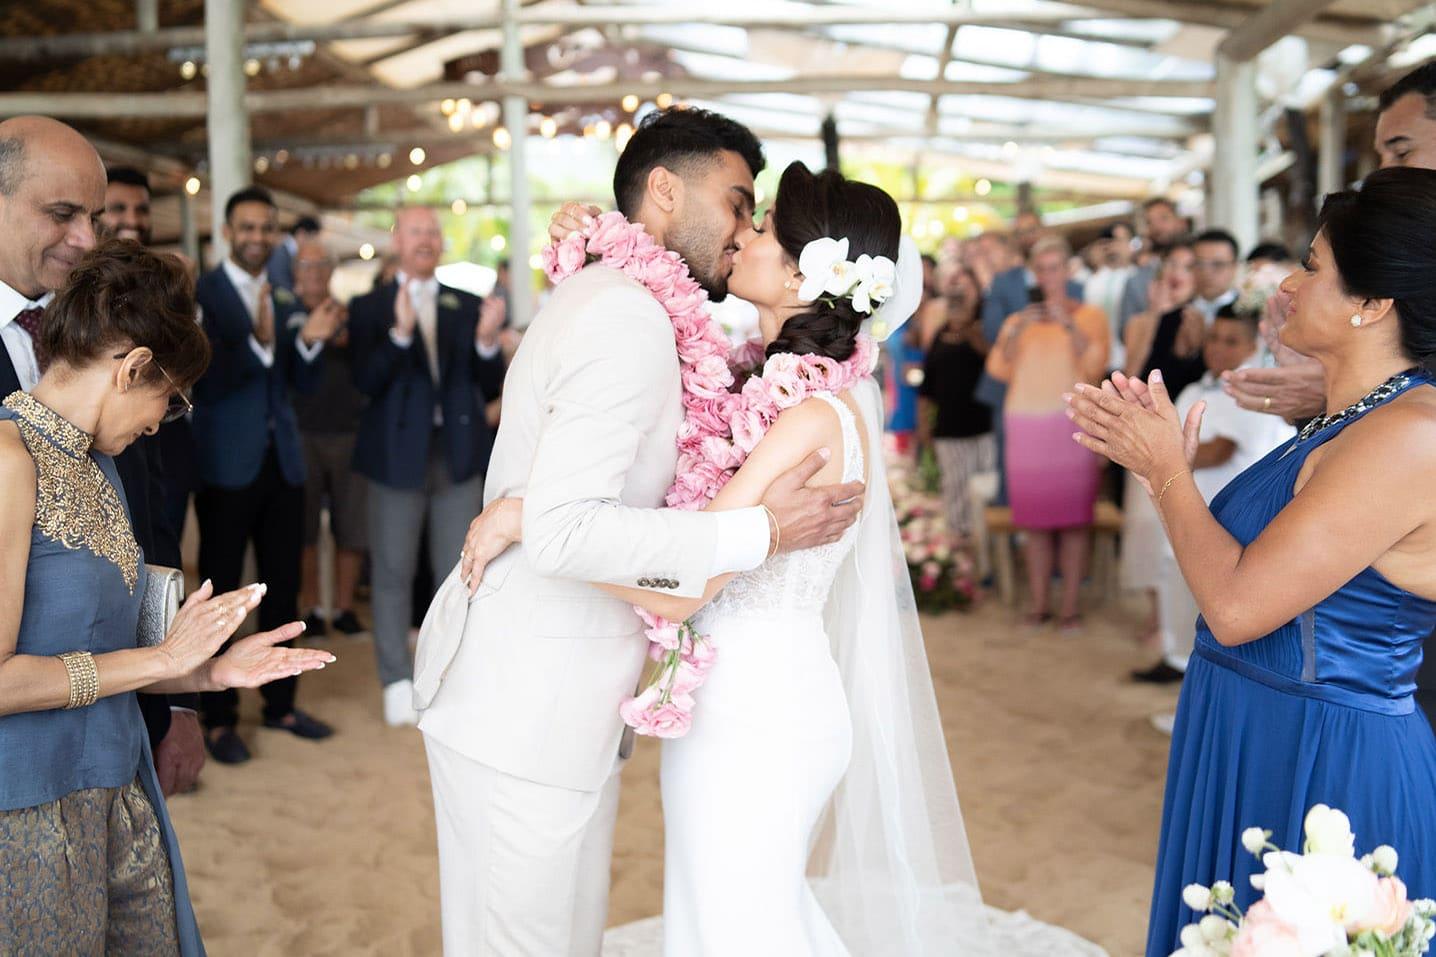 getrouwd kus bloemenkransen